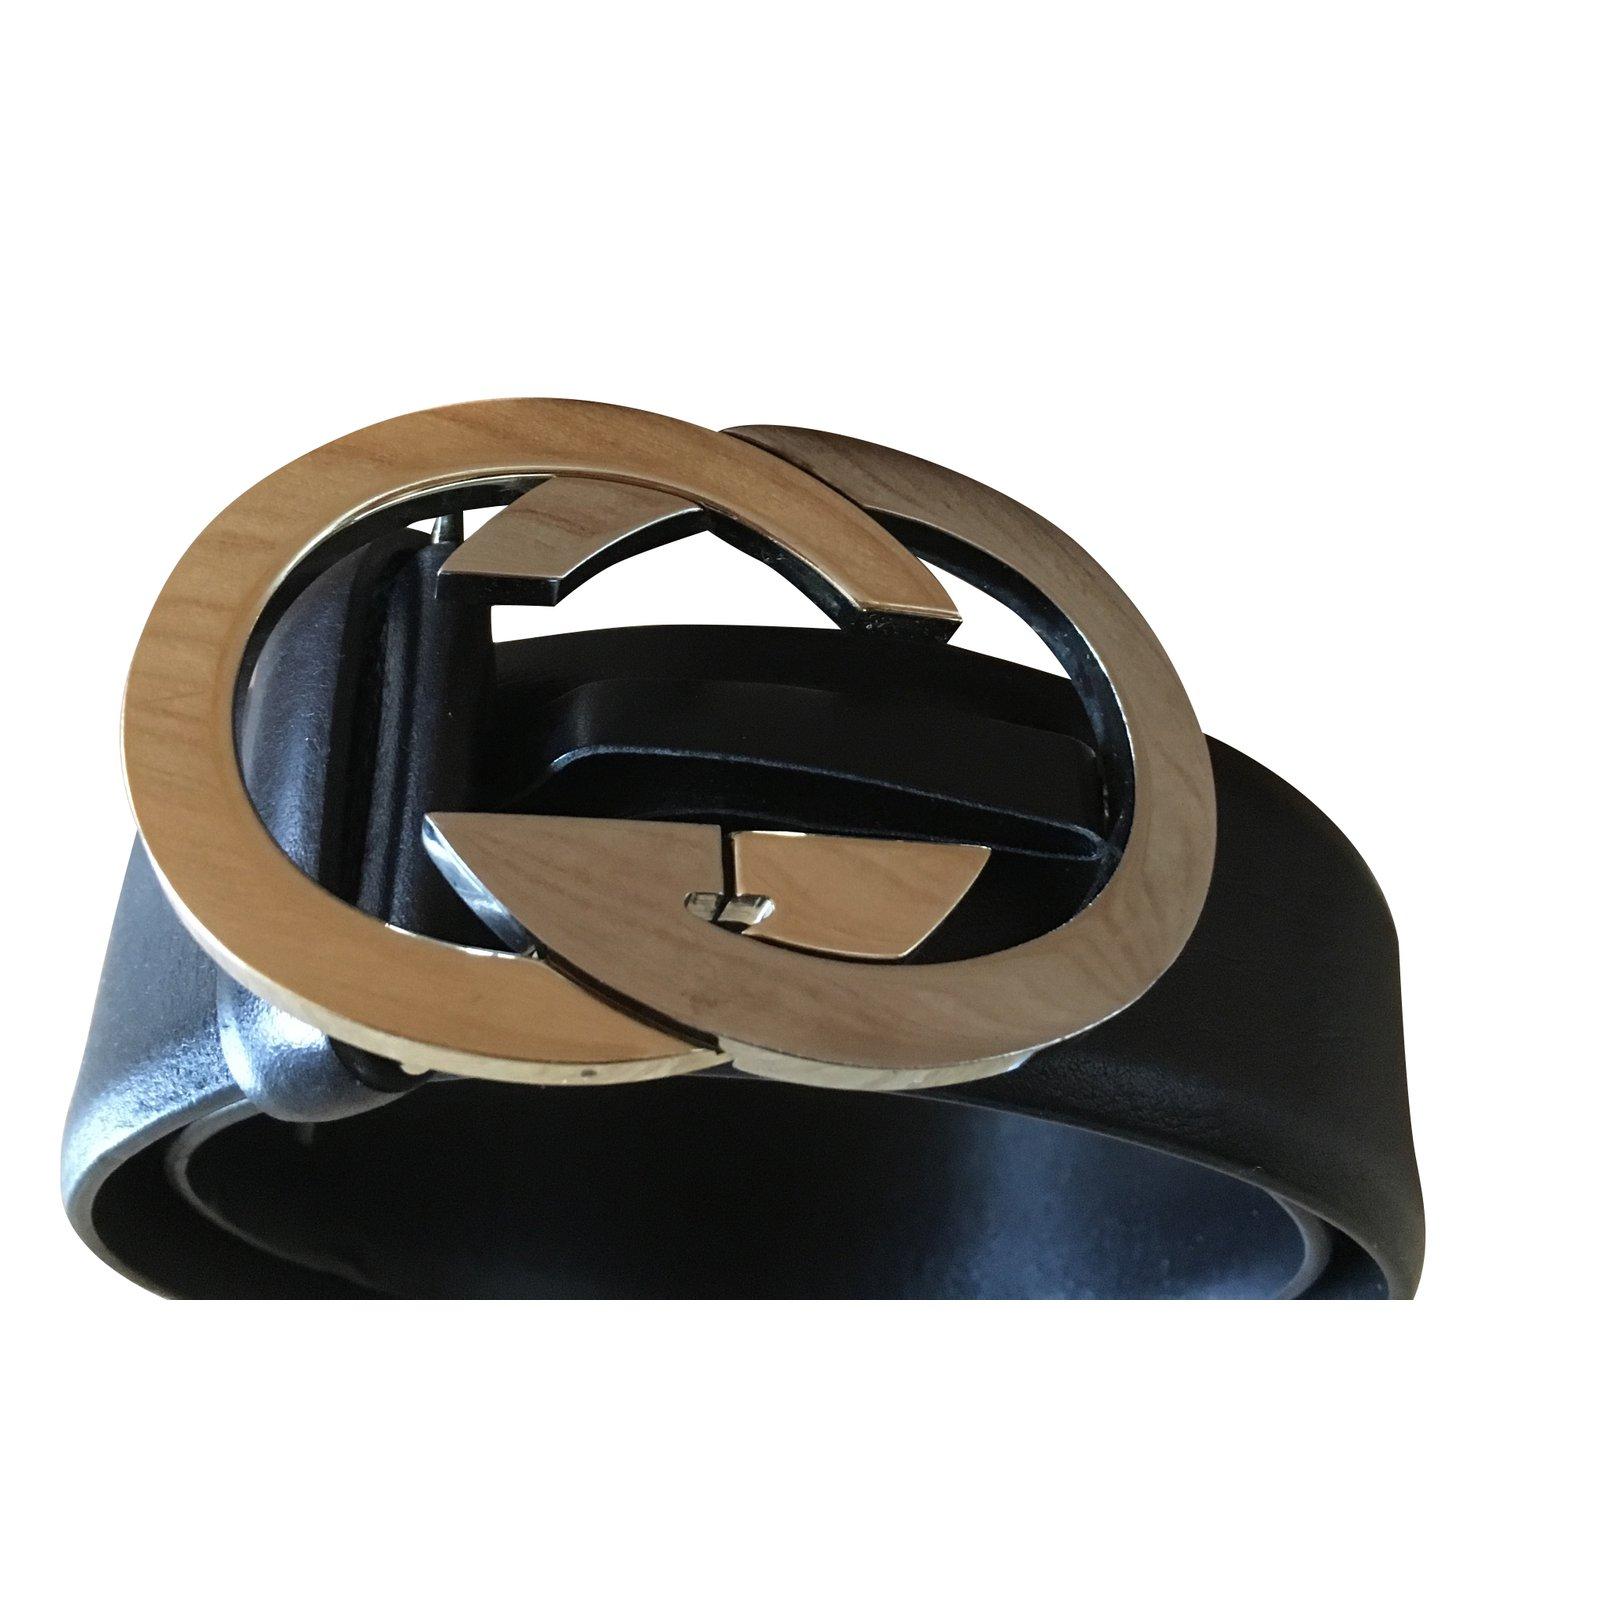 49104b50500 Ceintures Gucci Ceinture Cuir Noir ref.38865 - Joli Closet